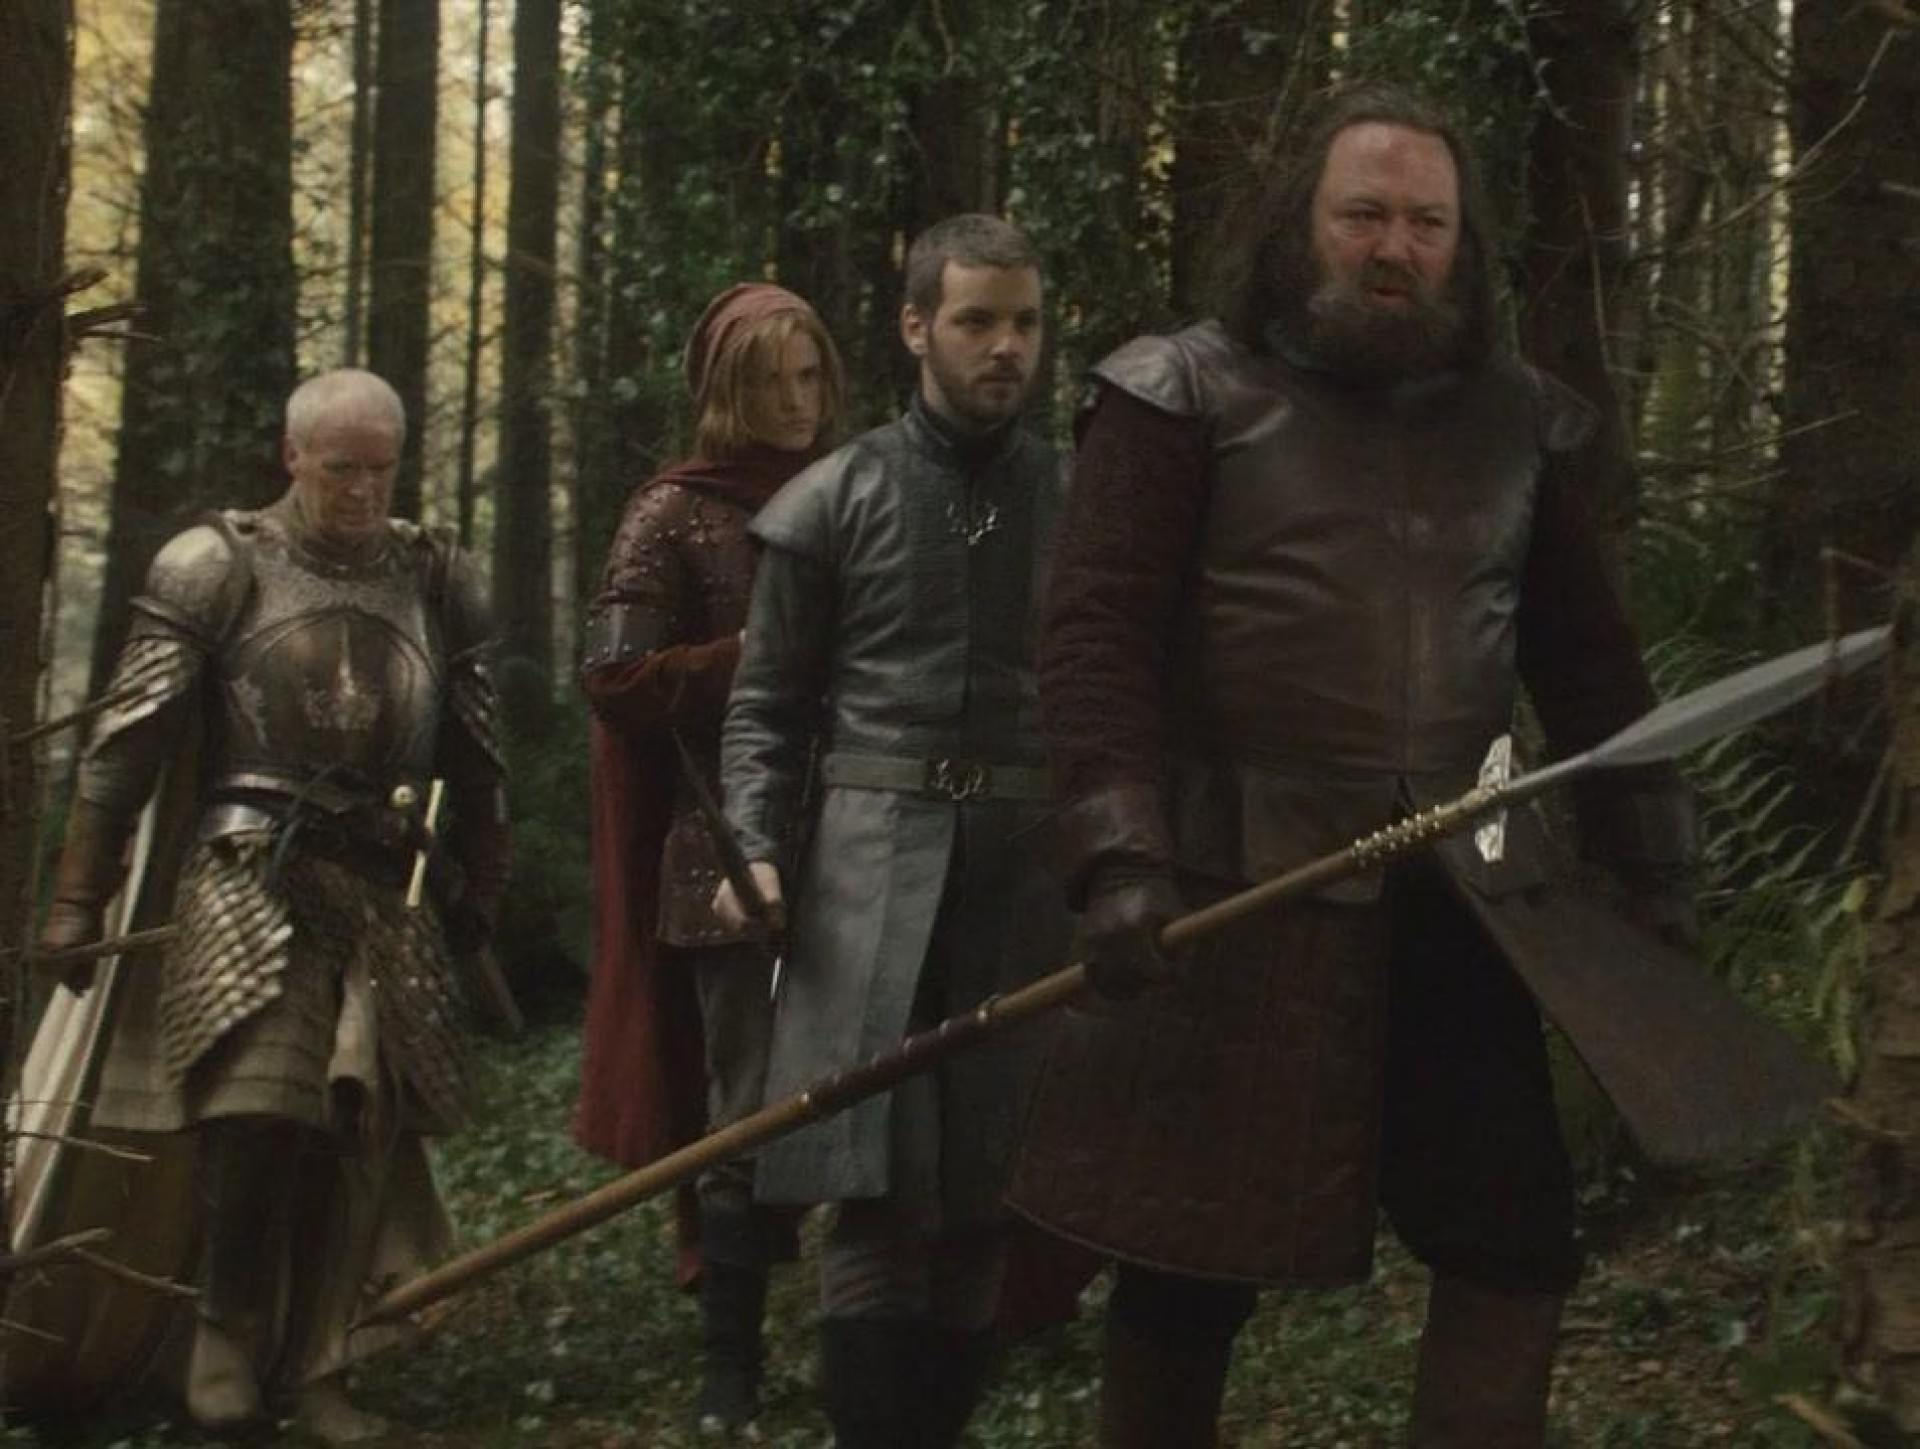 (《Game of thrones》 中慘死在野豬下,拿著野豬矛的國王Robert。 圖片來自:http://gameofthrones.wikia.com/wiki/Robert_Baratheon)